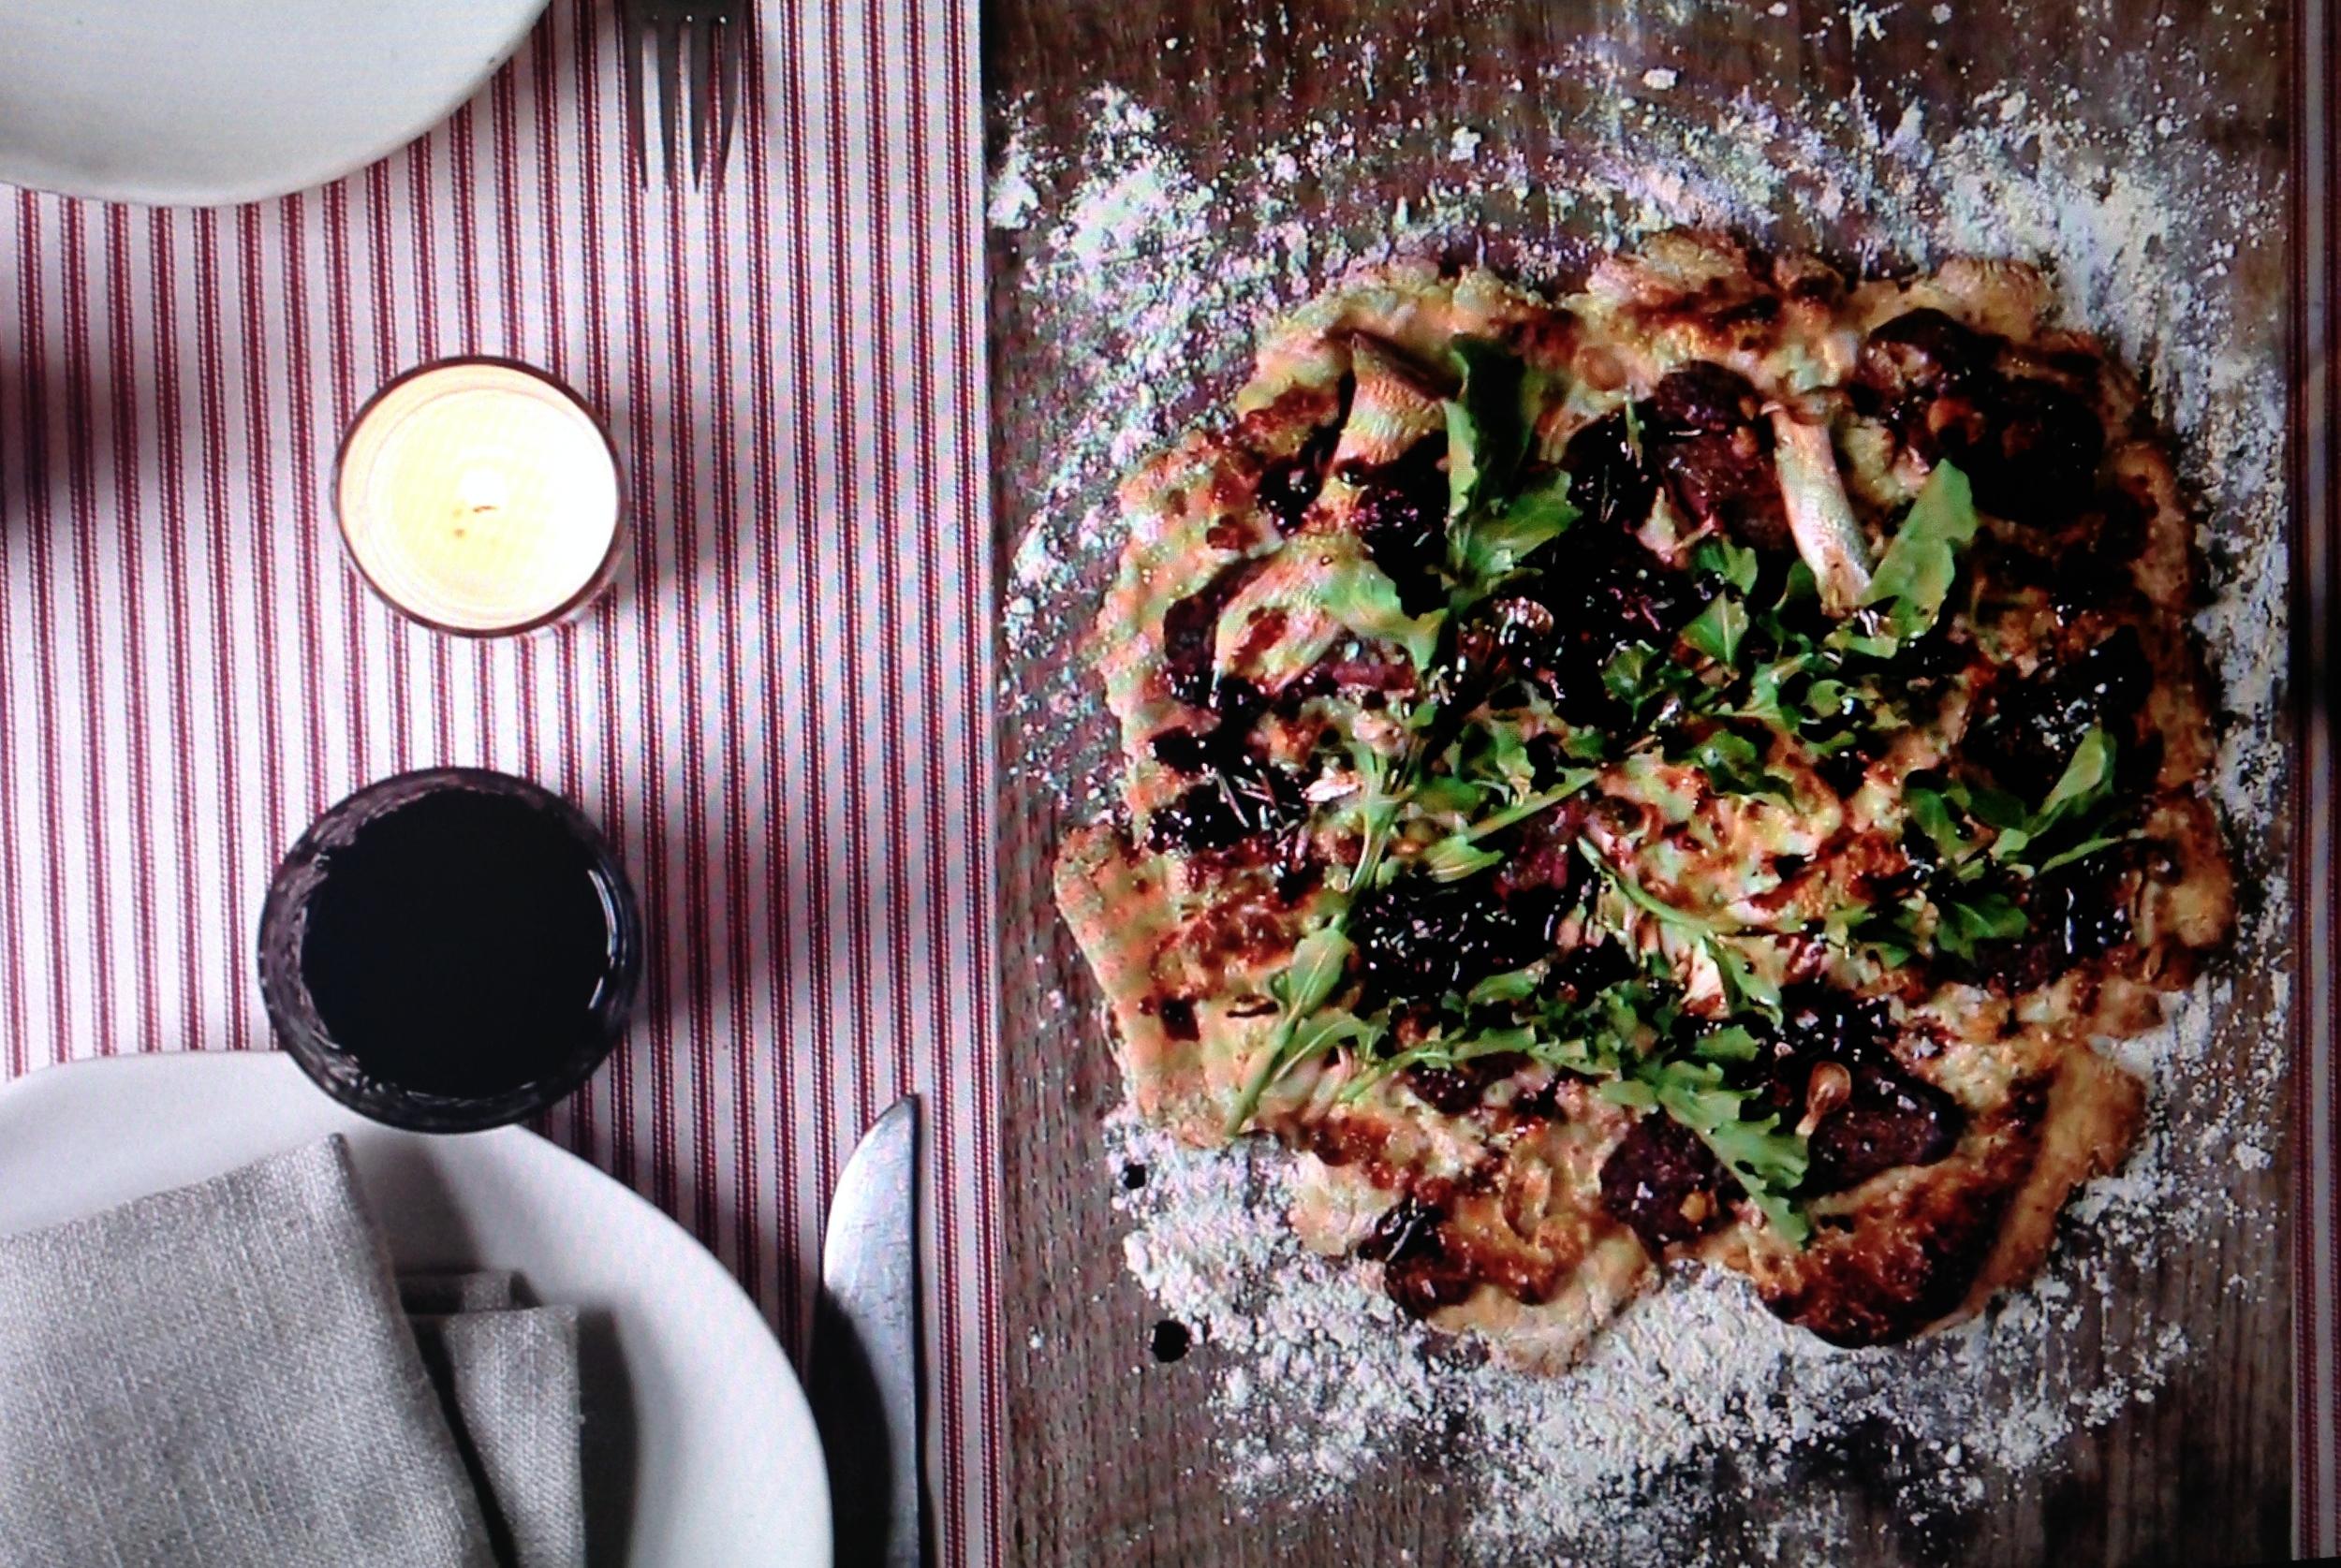 Urban_Huntsman_Venison_Pizza.JPG